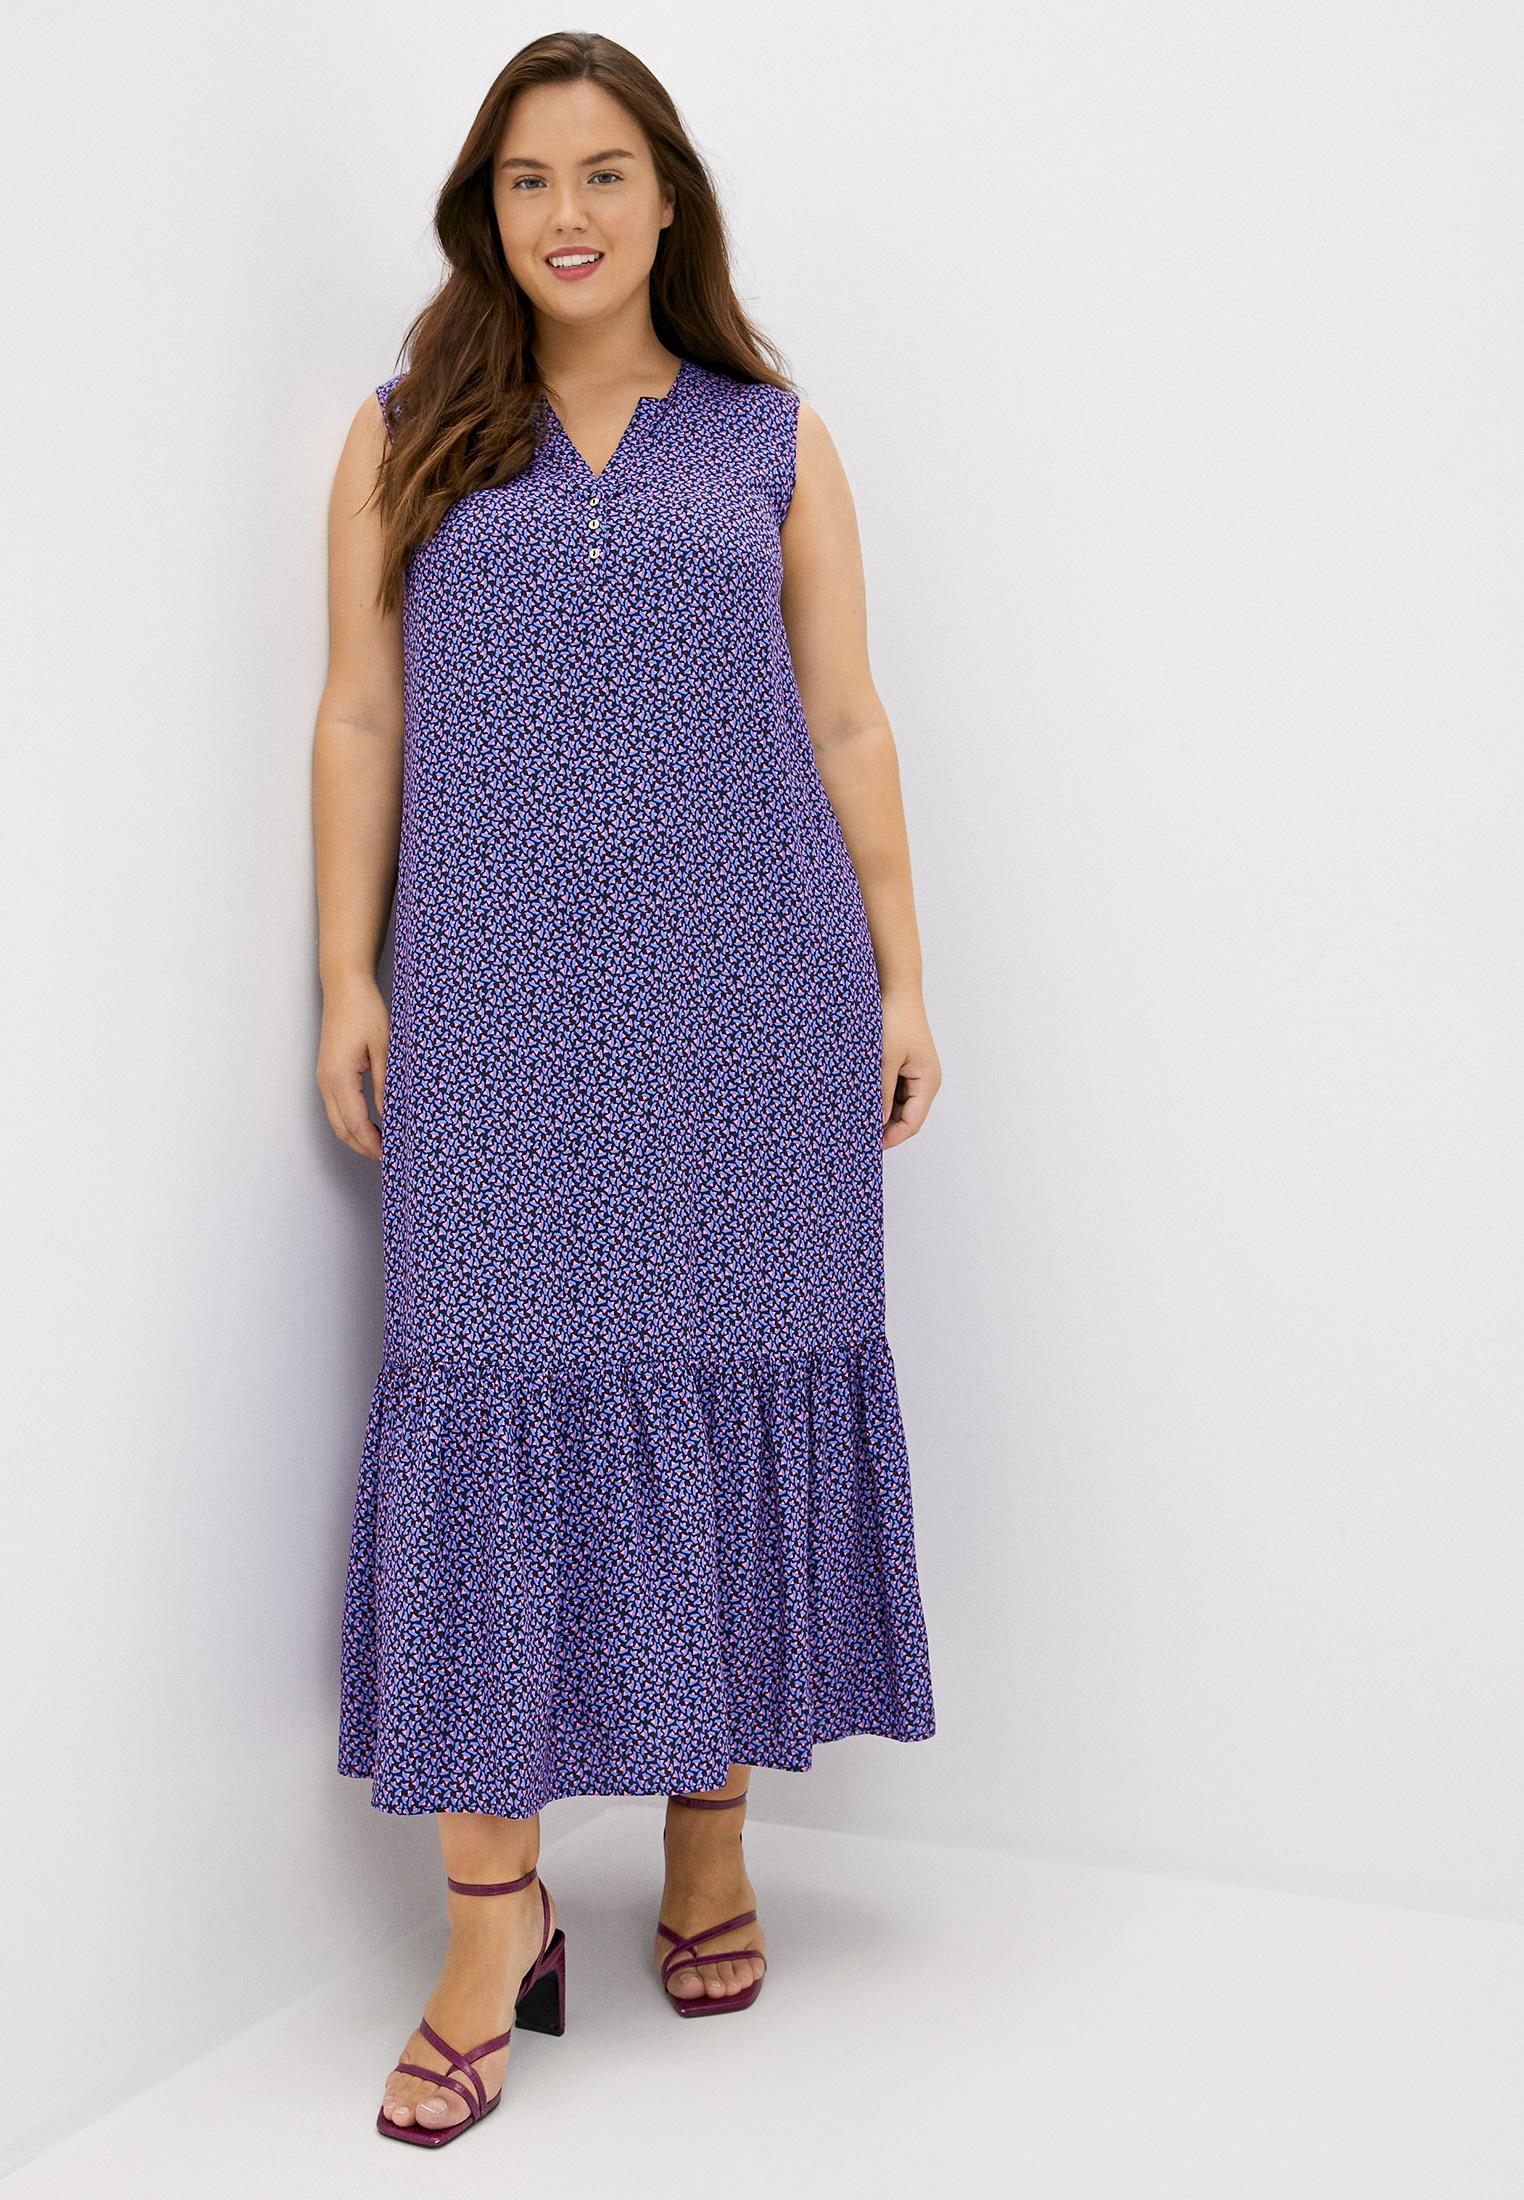 Повседневное платье Finn Flare (Фин Флаер) S19-14096